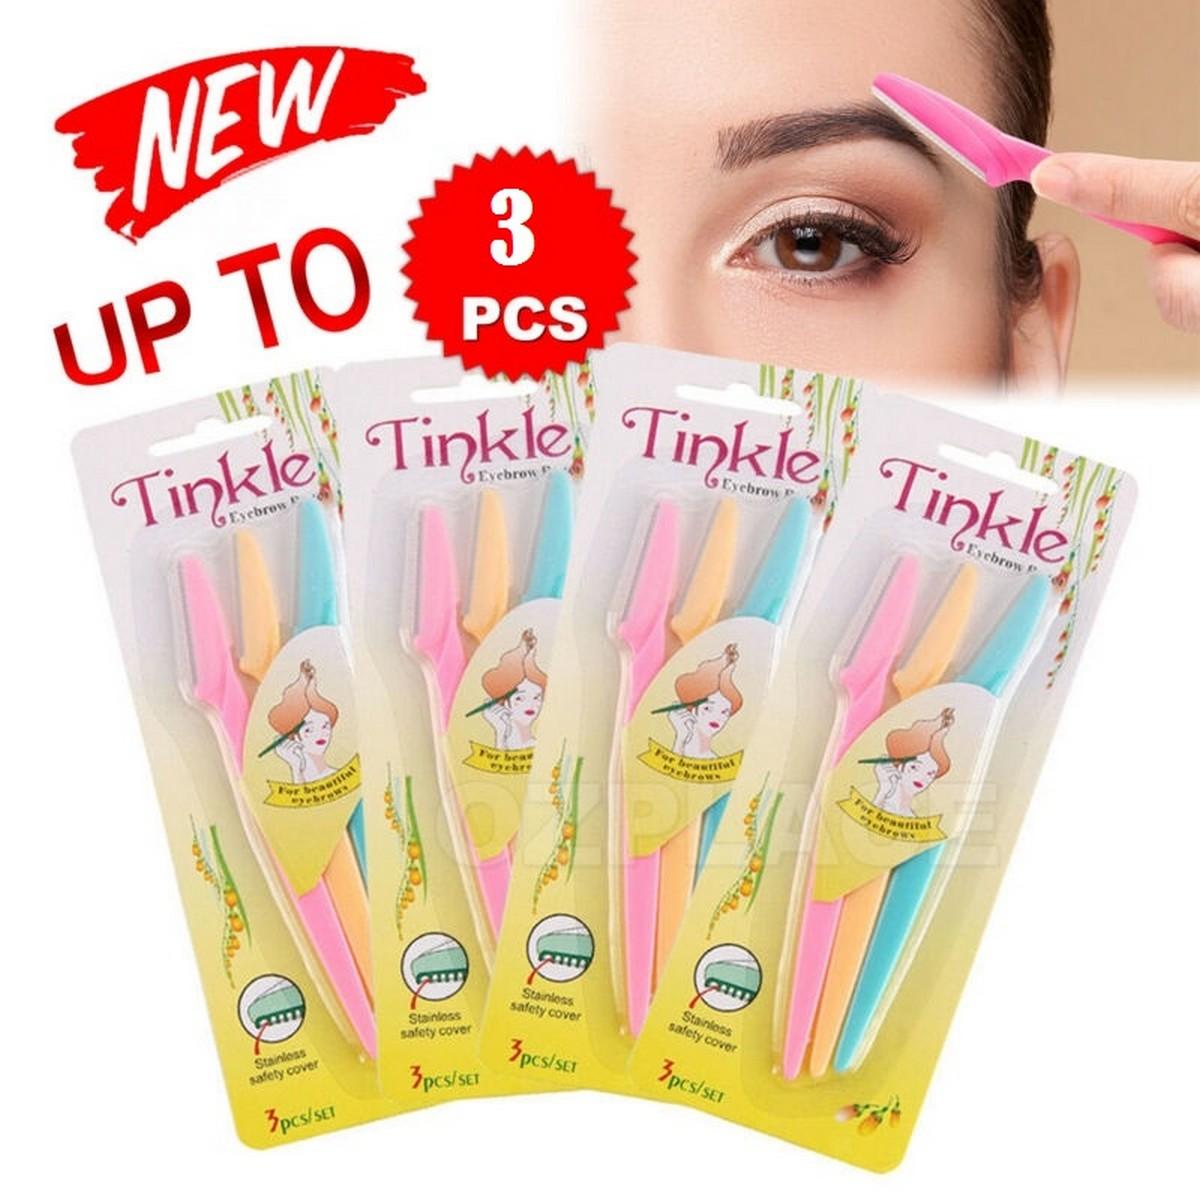 Tinkle Eye Brow Razor ( Pack of 3)